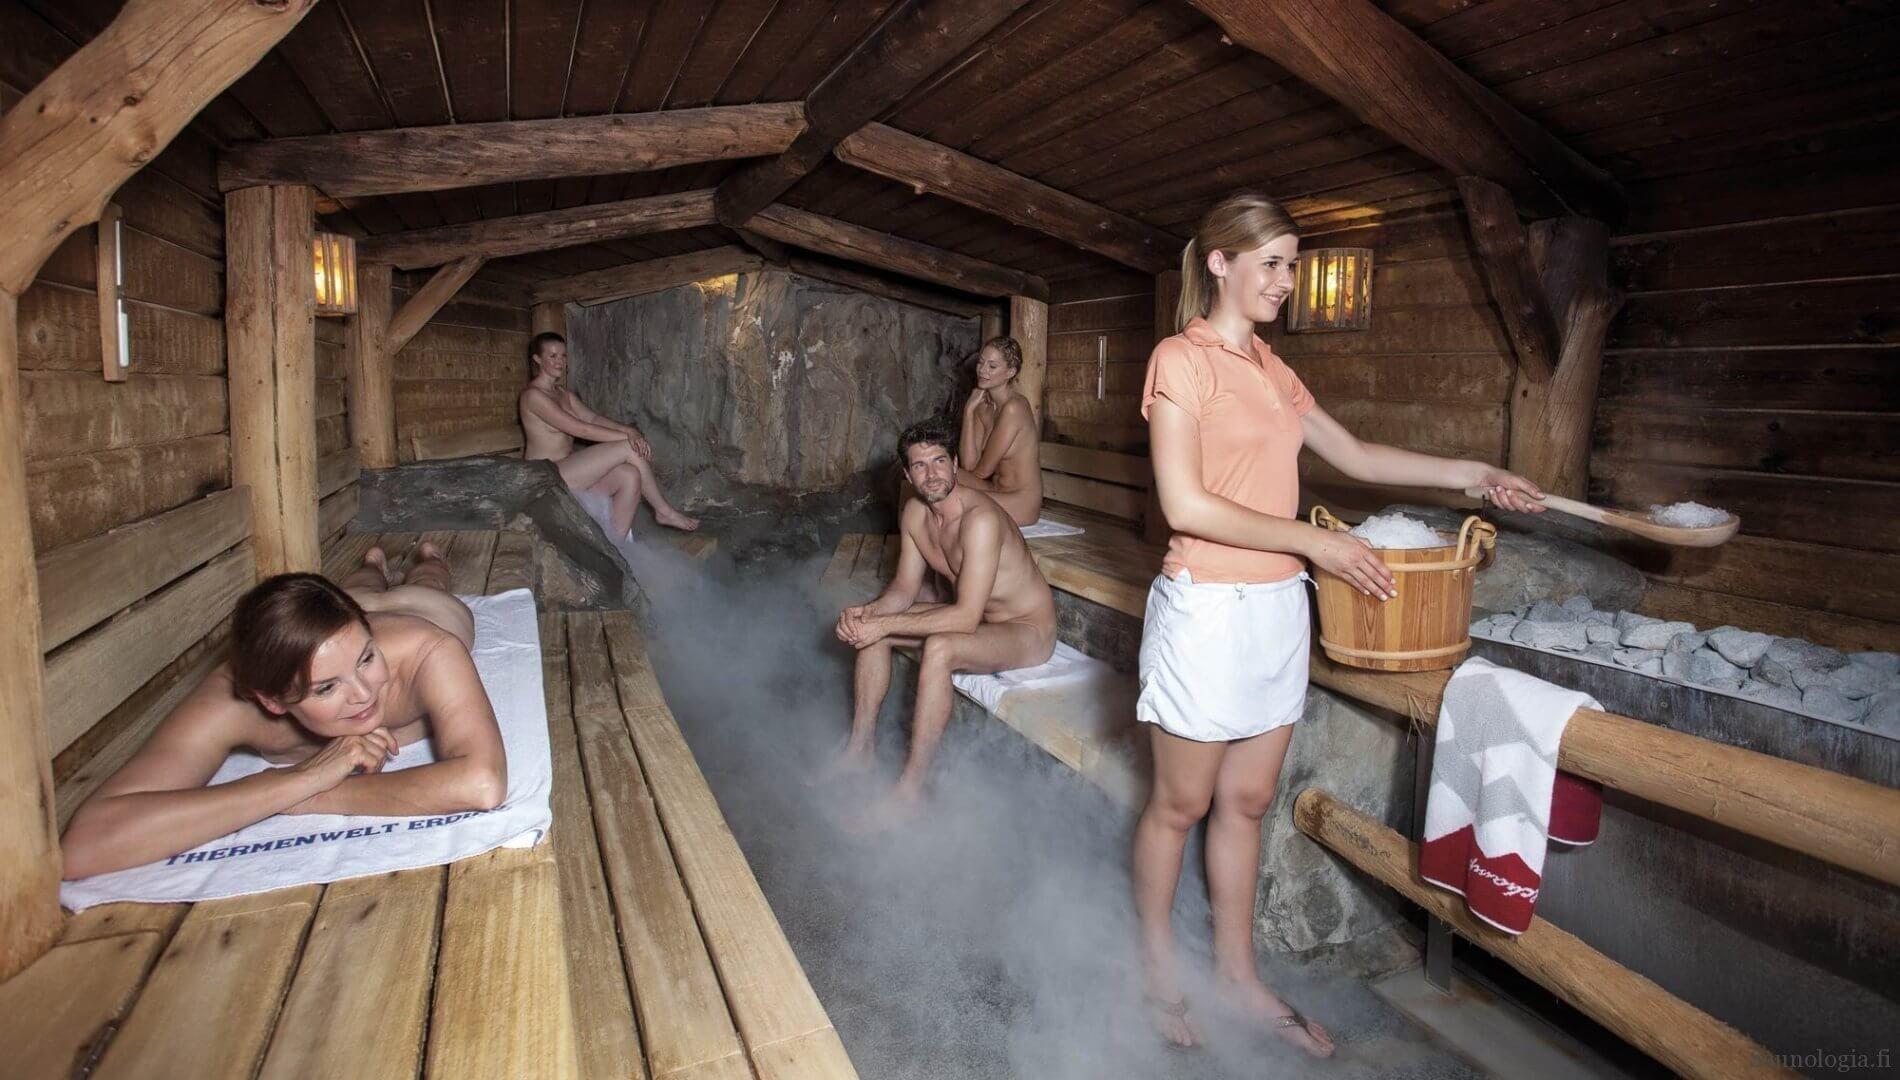 The worlds largest sauna center at Therme Erding | Sauna